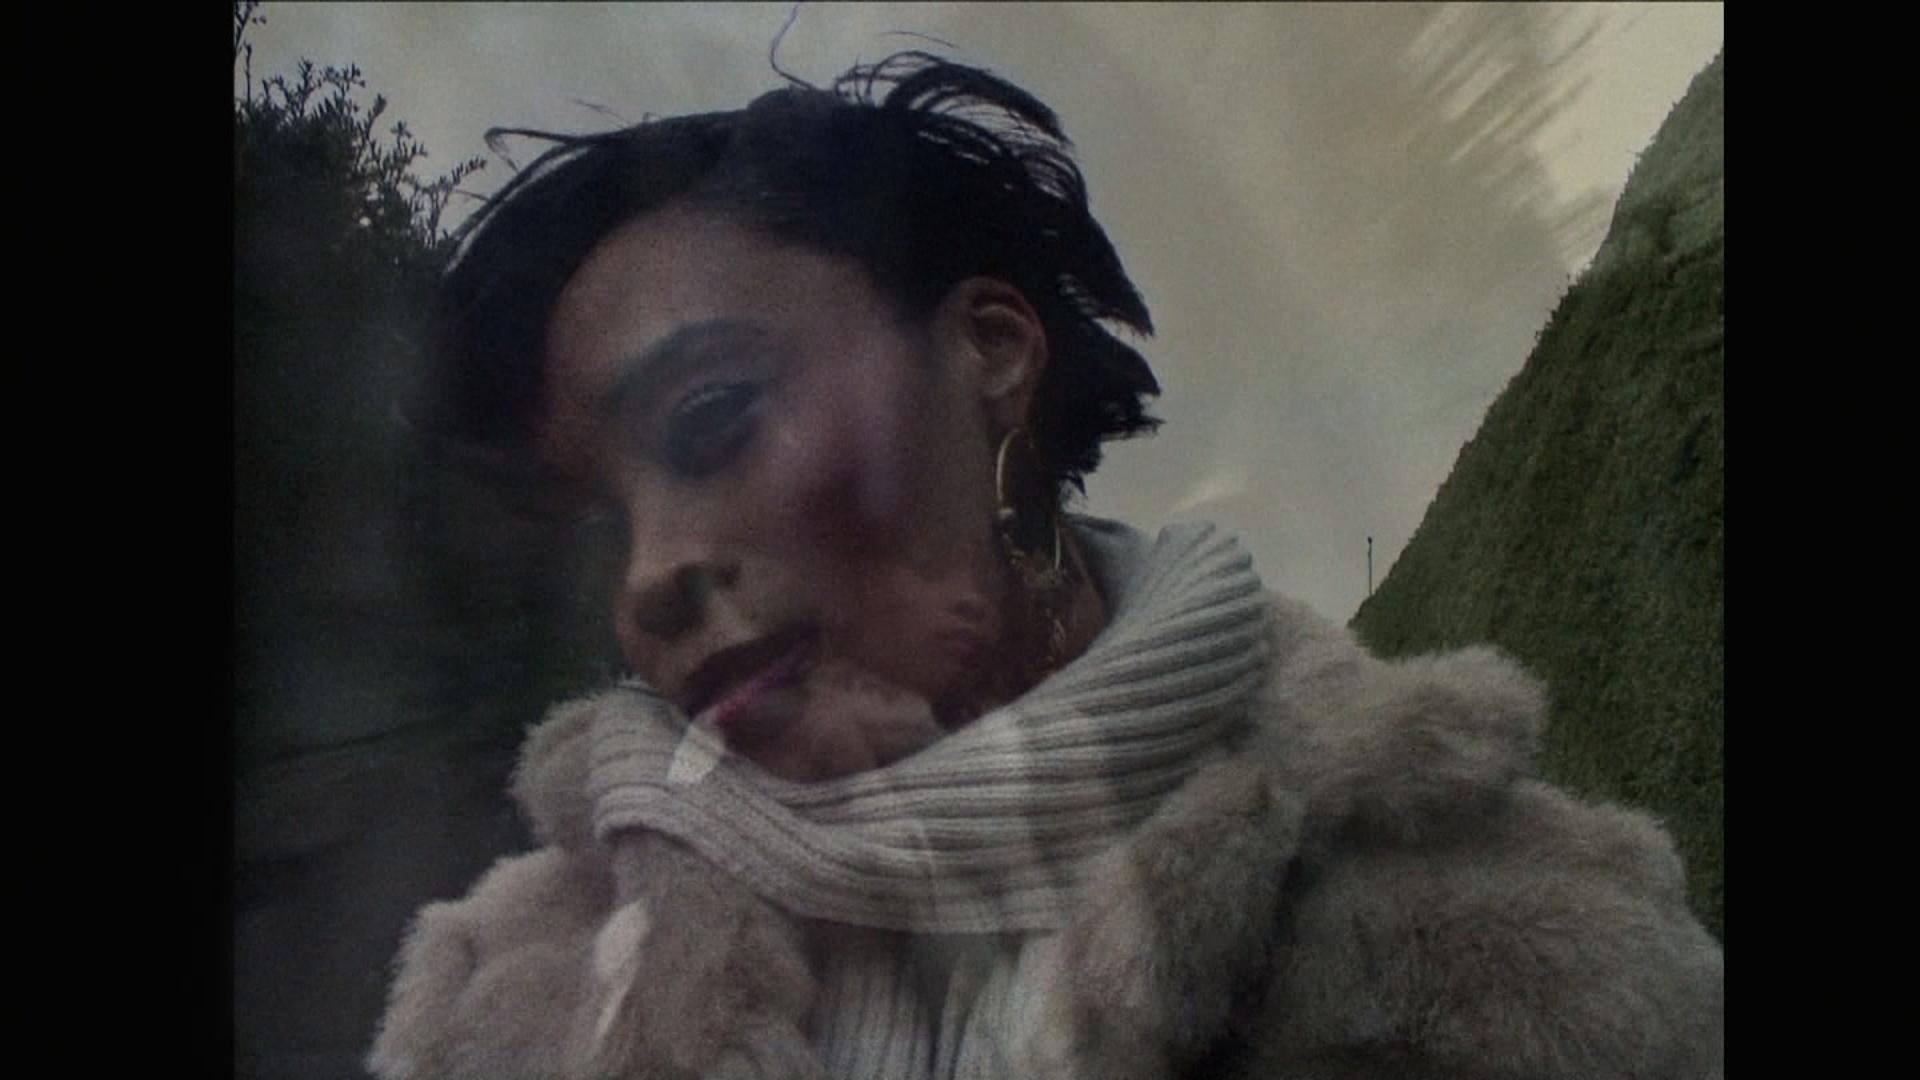 Rohan Quine, 'The Imagination Thief' - film 'ALAIA 34', still 4